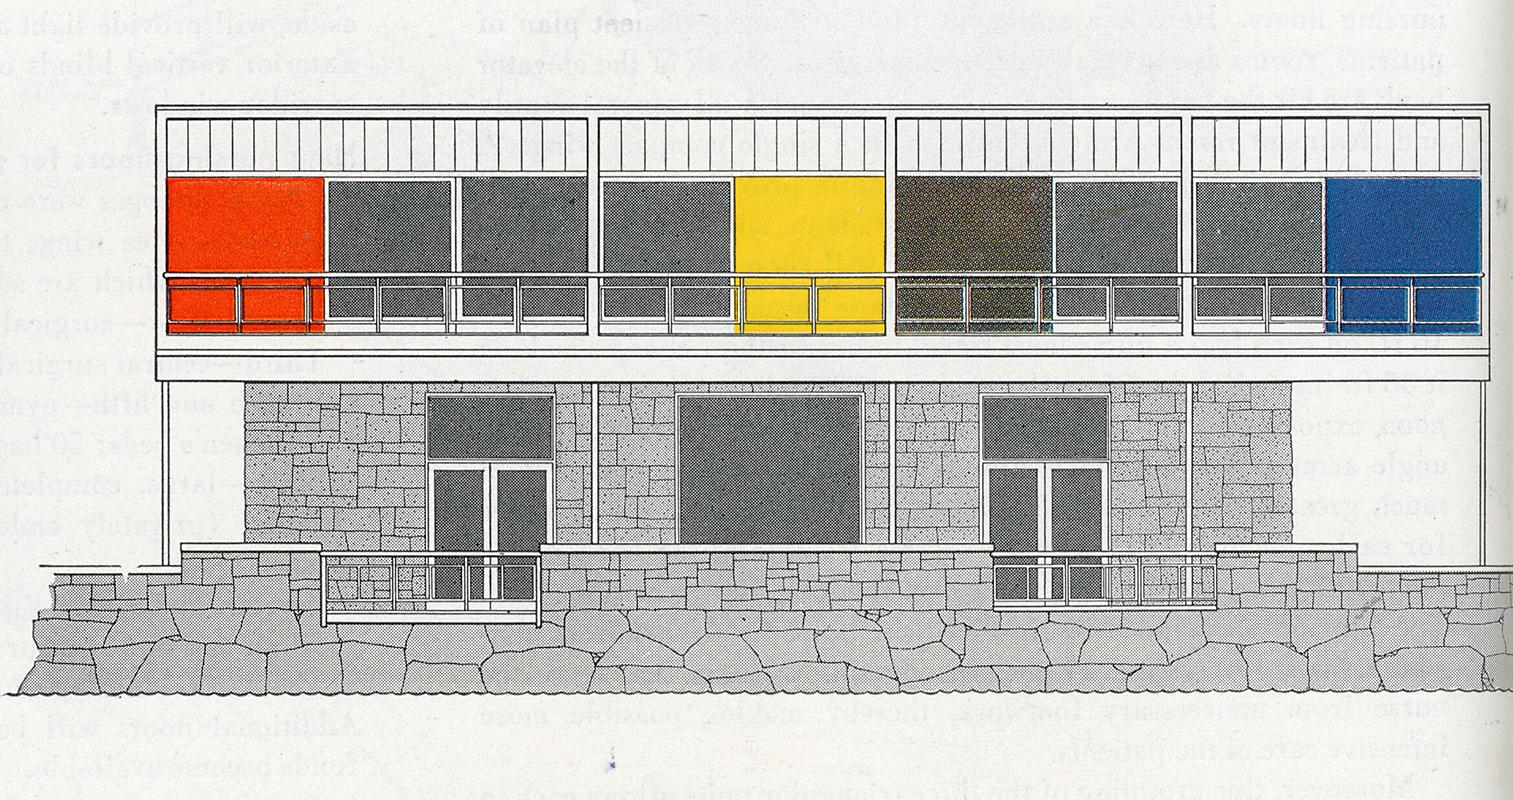 Robert R. Rahman and John H. Langlois. Architectural Forum Jul 1950, 96